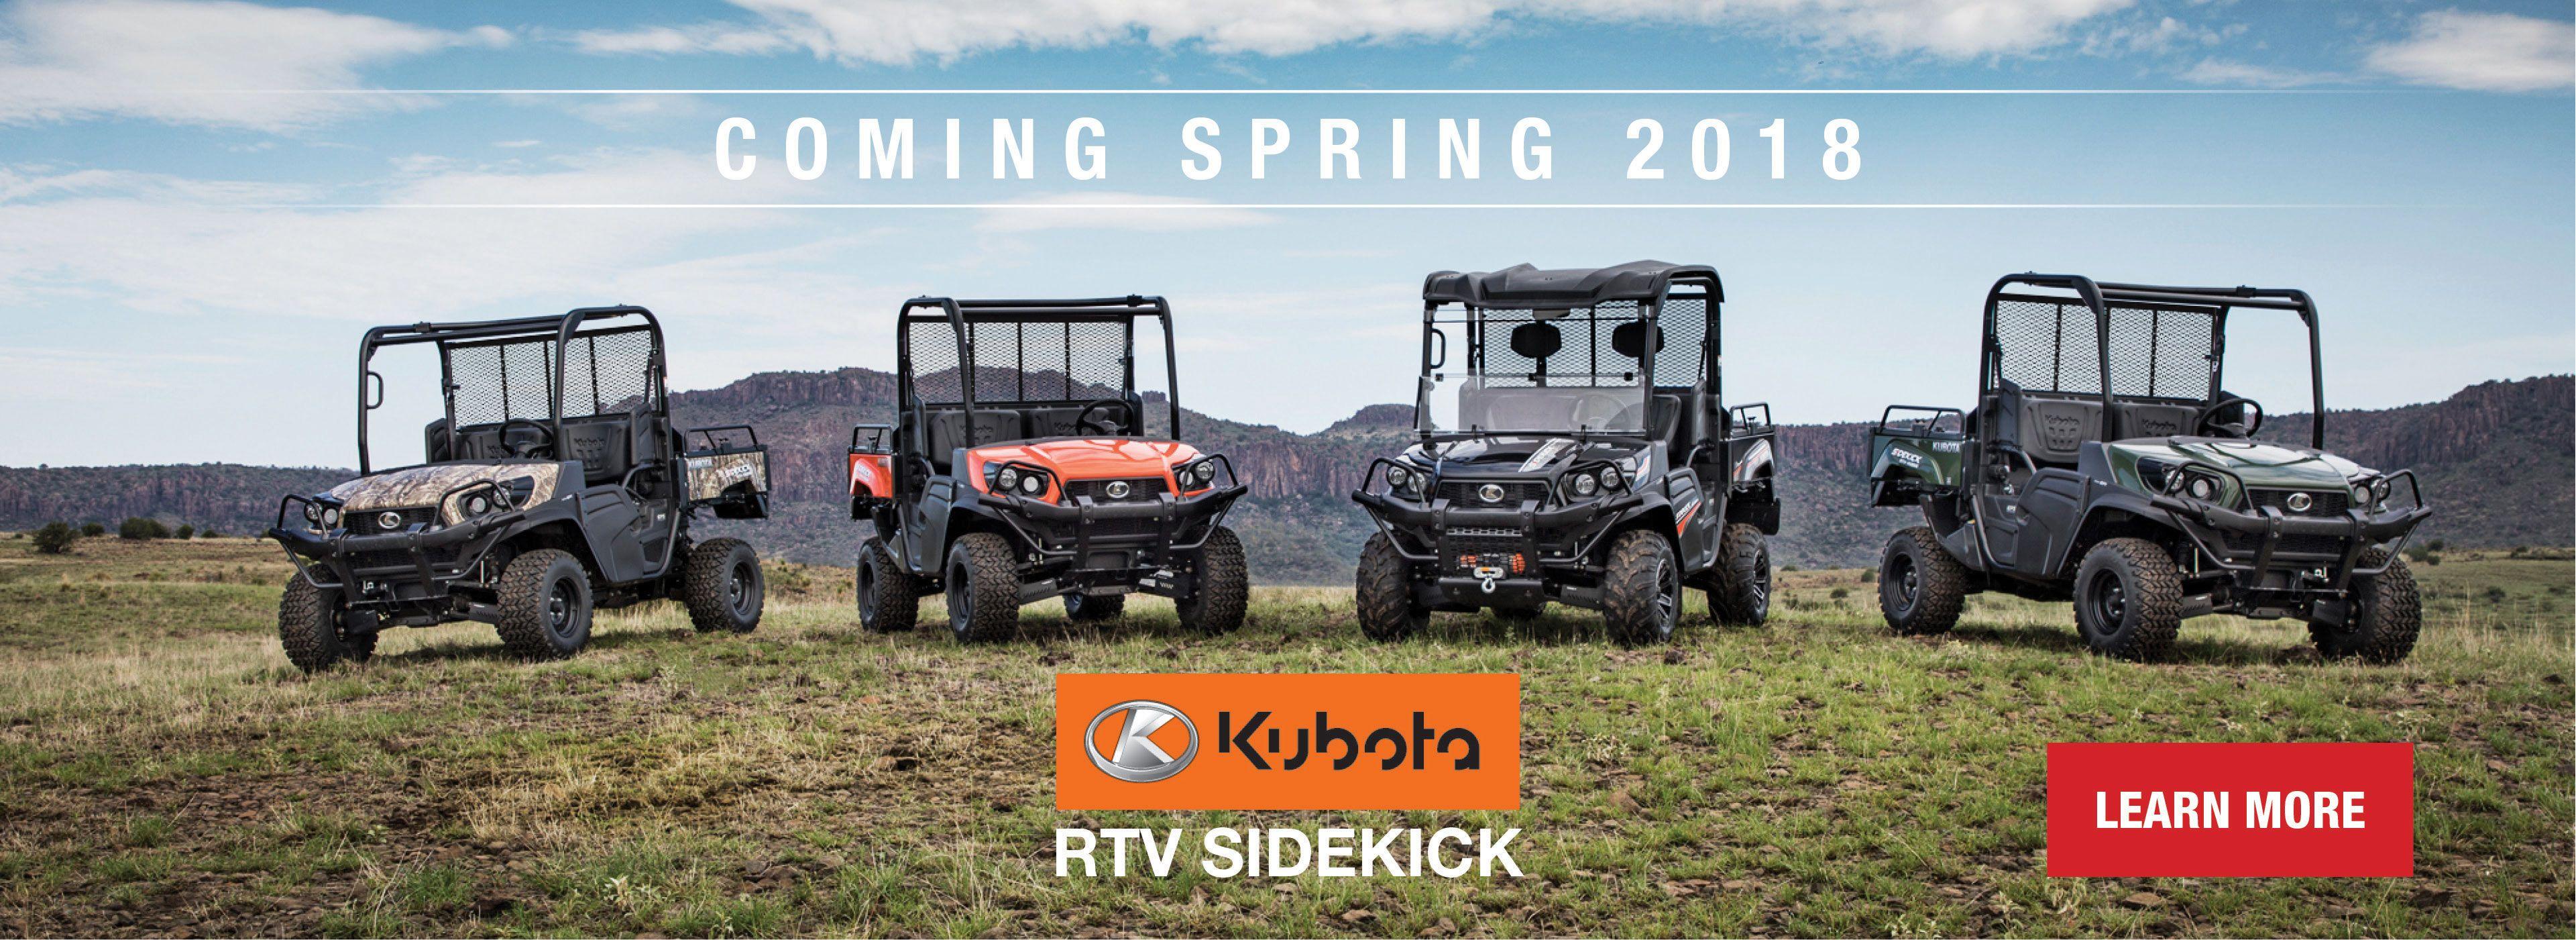 Kubota RTV Sidekick Line up